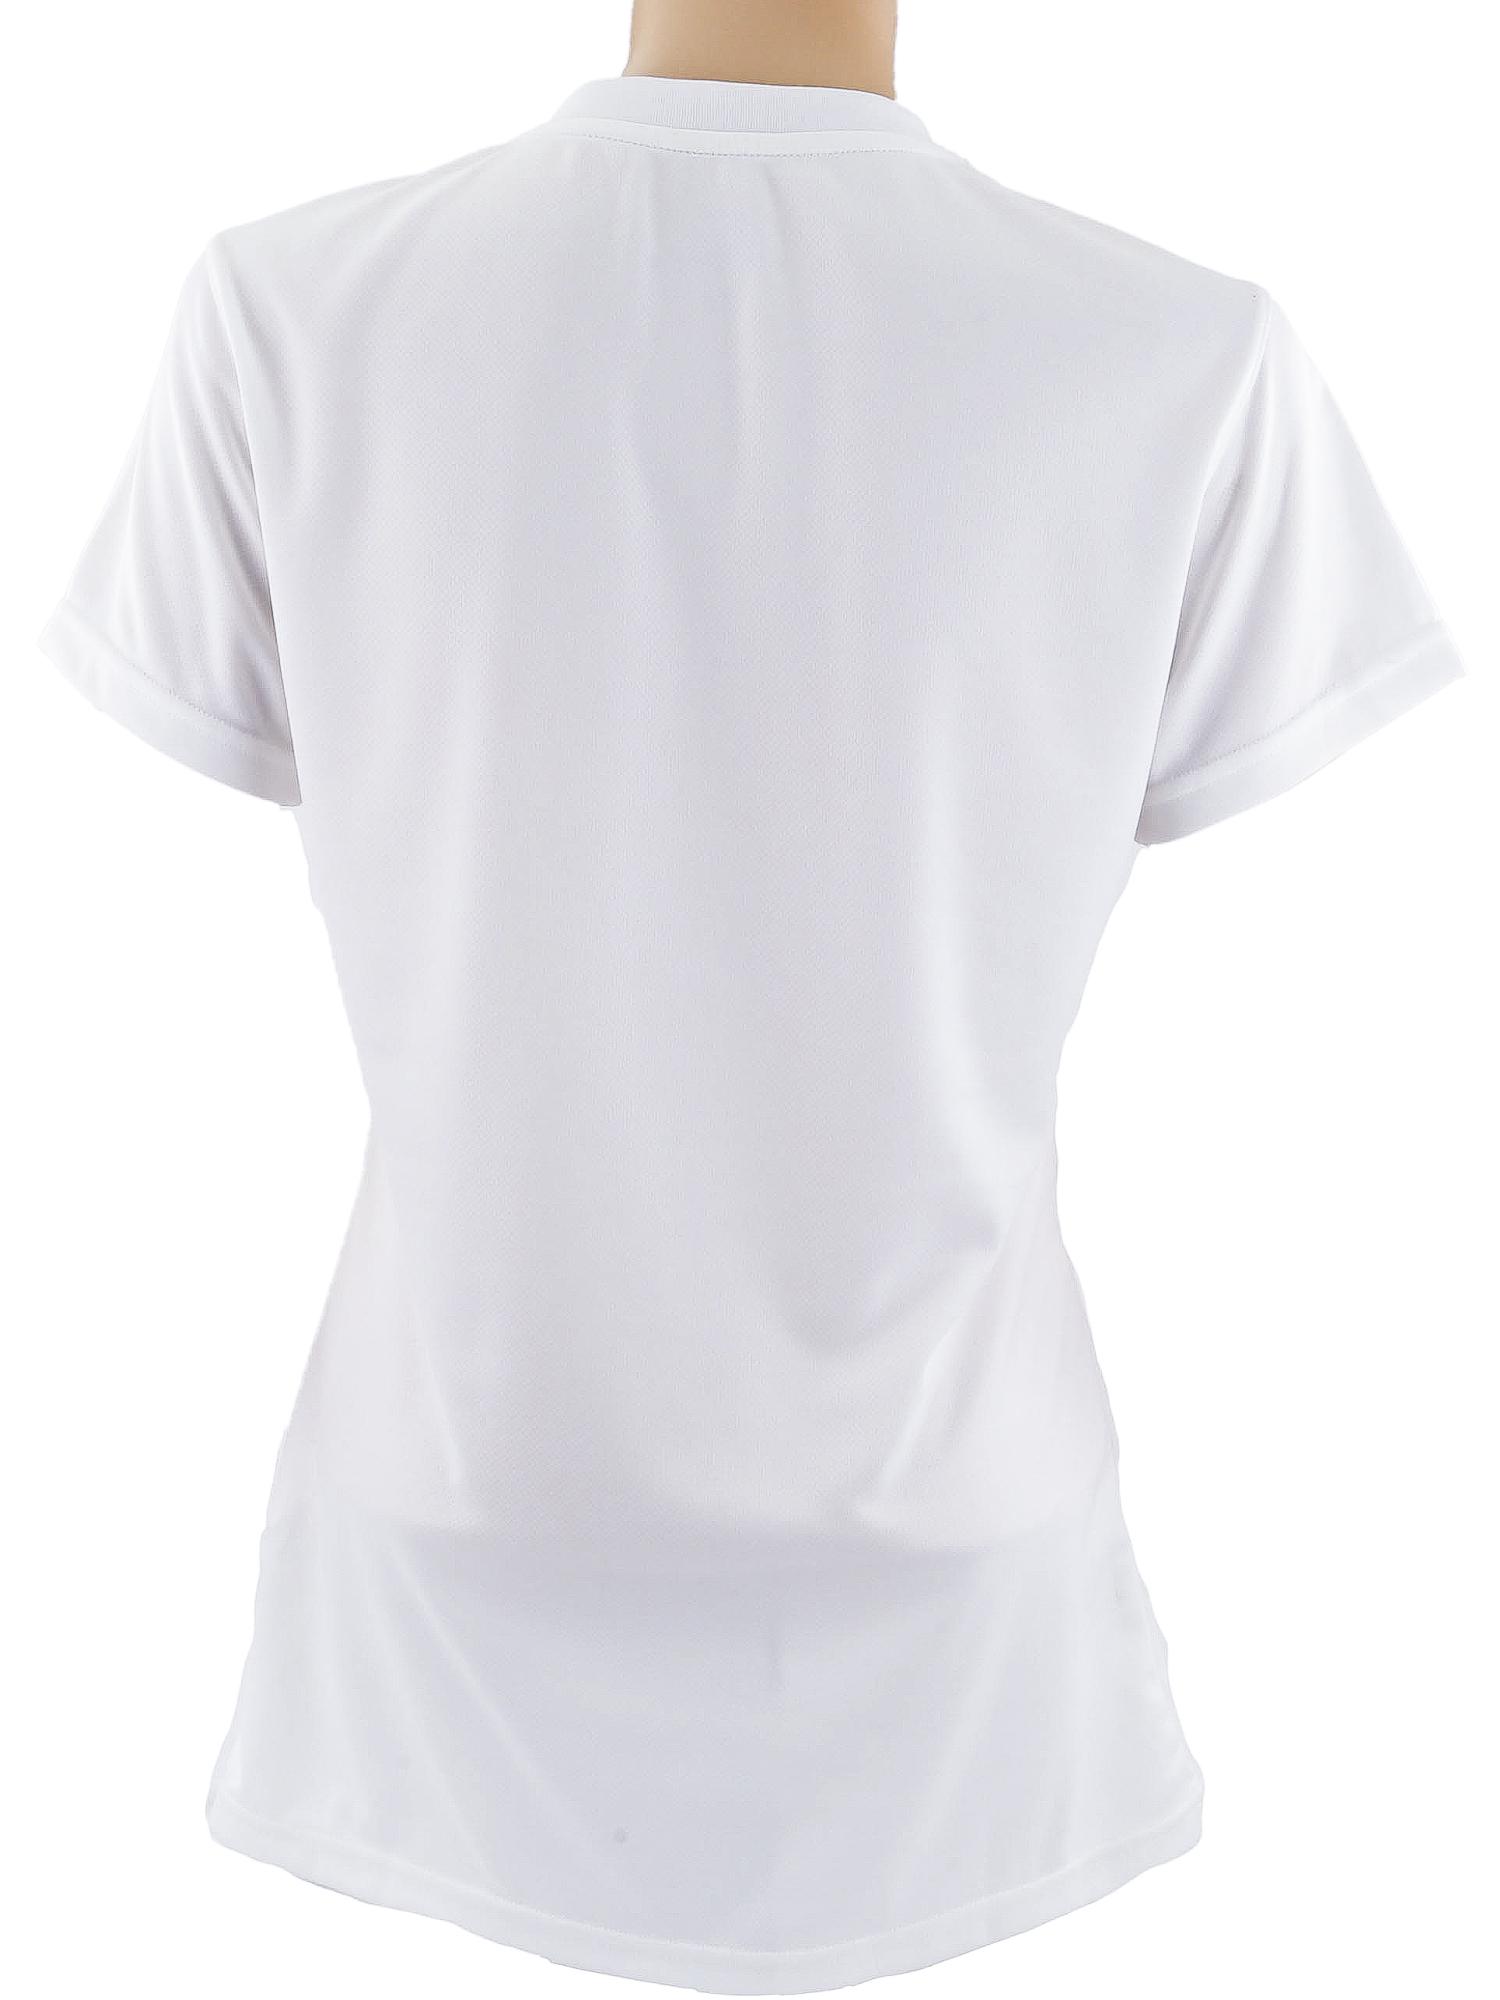 5be6a061086 Nike Women s Short Sleeve Digital Game Jersey 16 Soccer